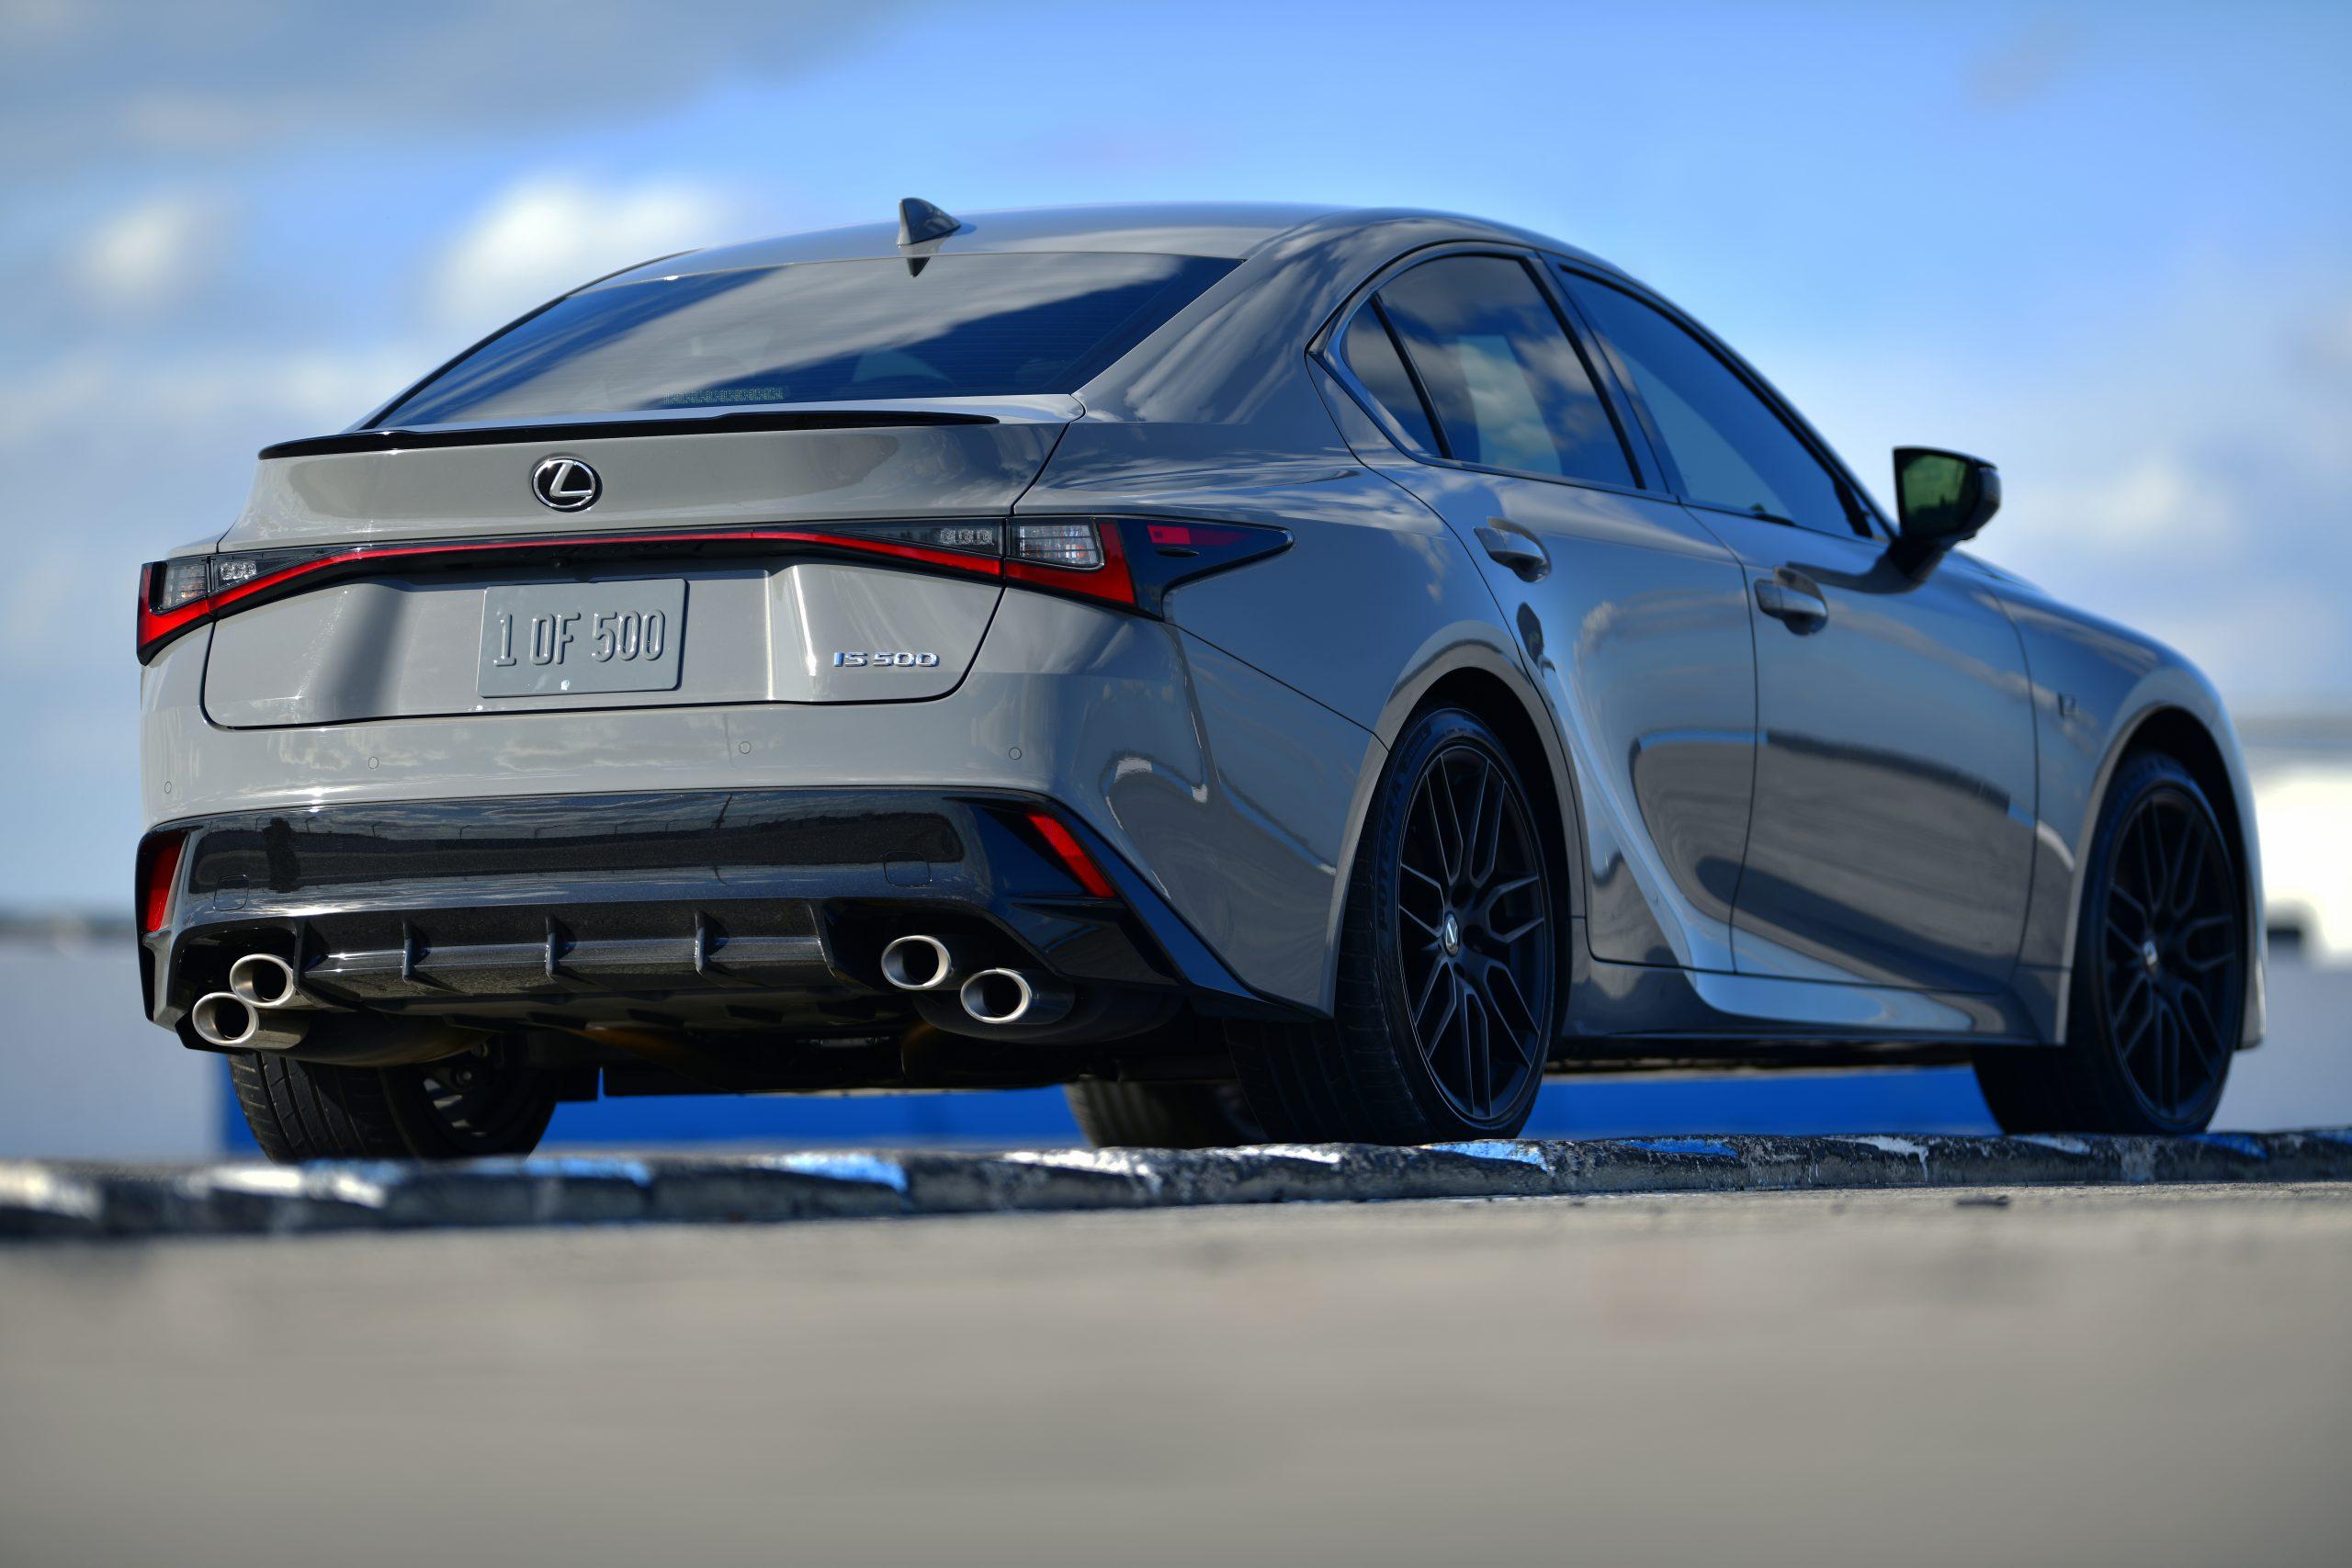 2022 Lexus IS 500 F Sport Launch Edition rear three quarter on track